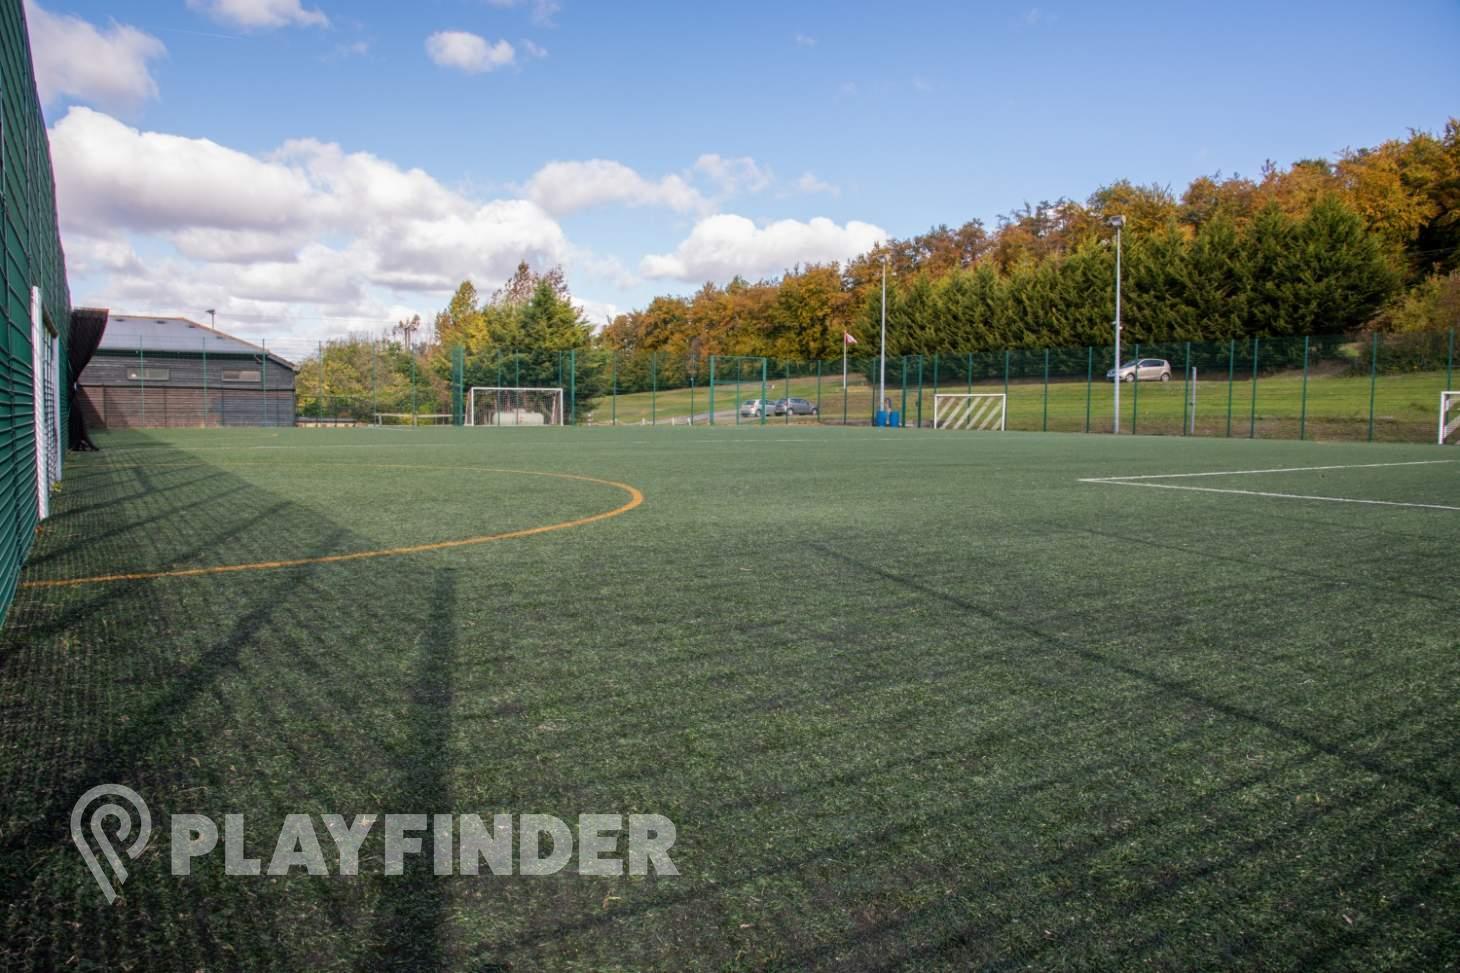 Corinthian Sports Club 5 a side | 3G Astroturf football pitch